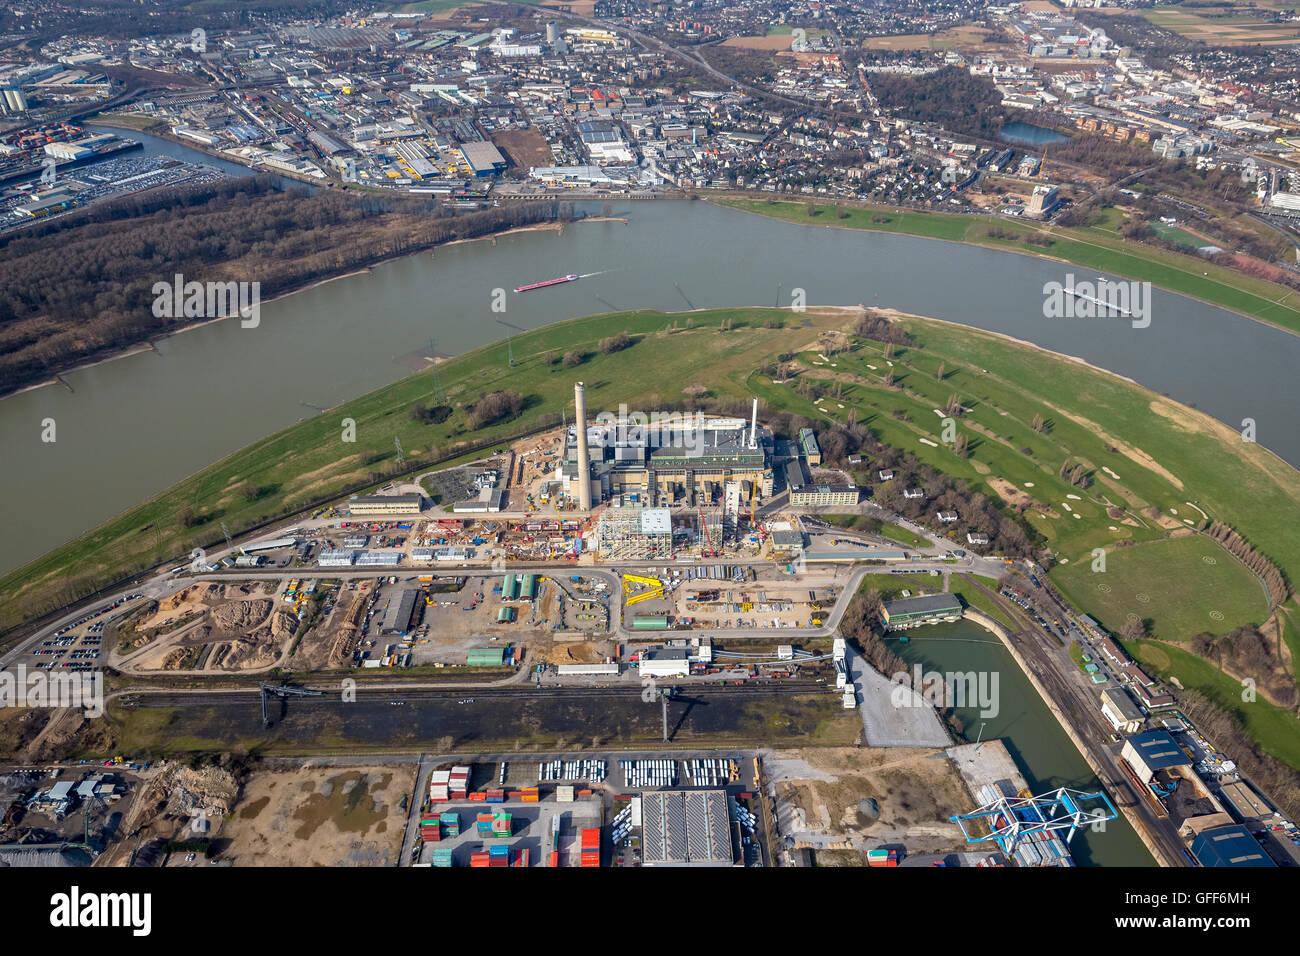 Aerial view, powerplant, Lausward the Rhine bow, Stadtwerke Duesseldorf, Duesseldorf, Rhineland, North Rhine-Westphalia, - Stock Image